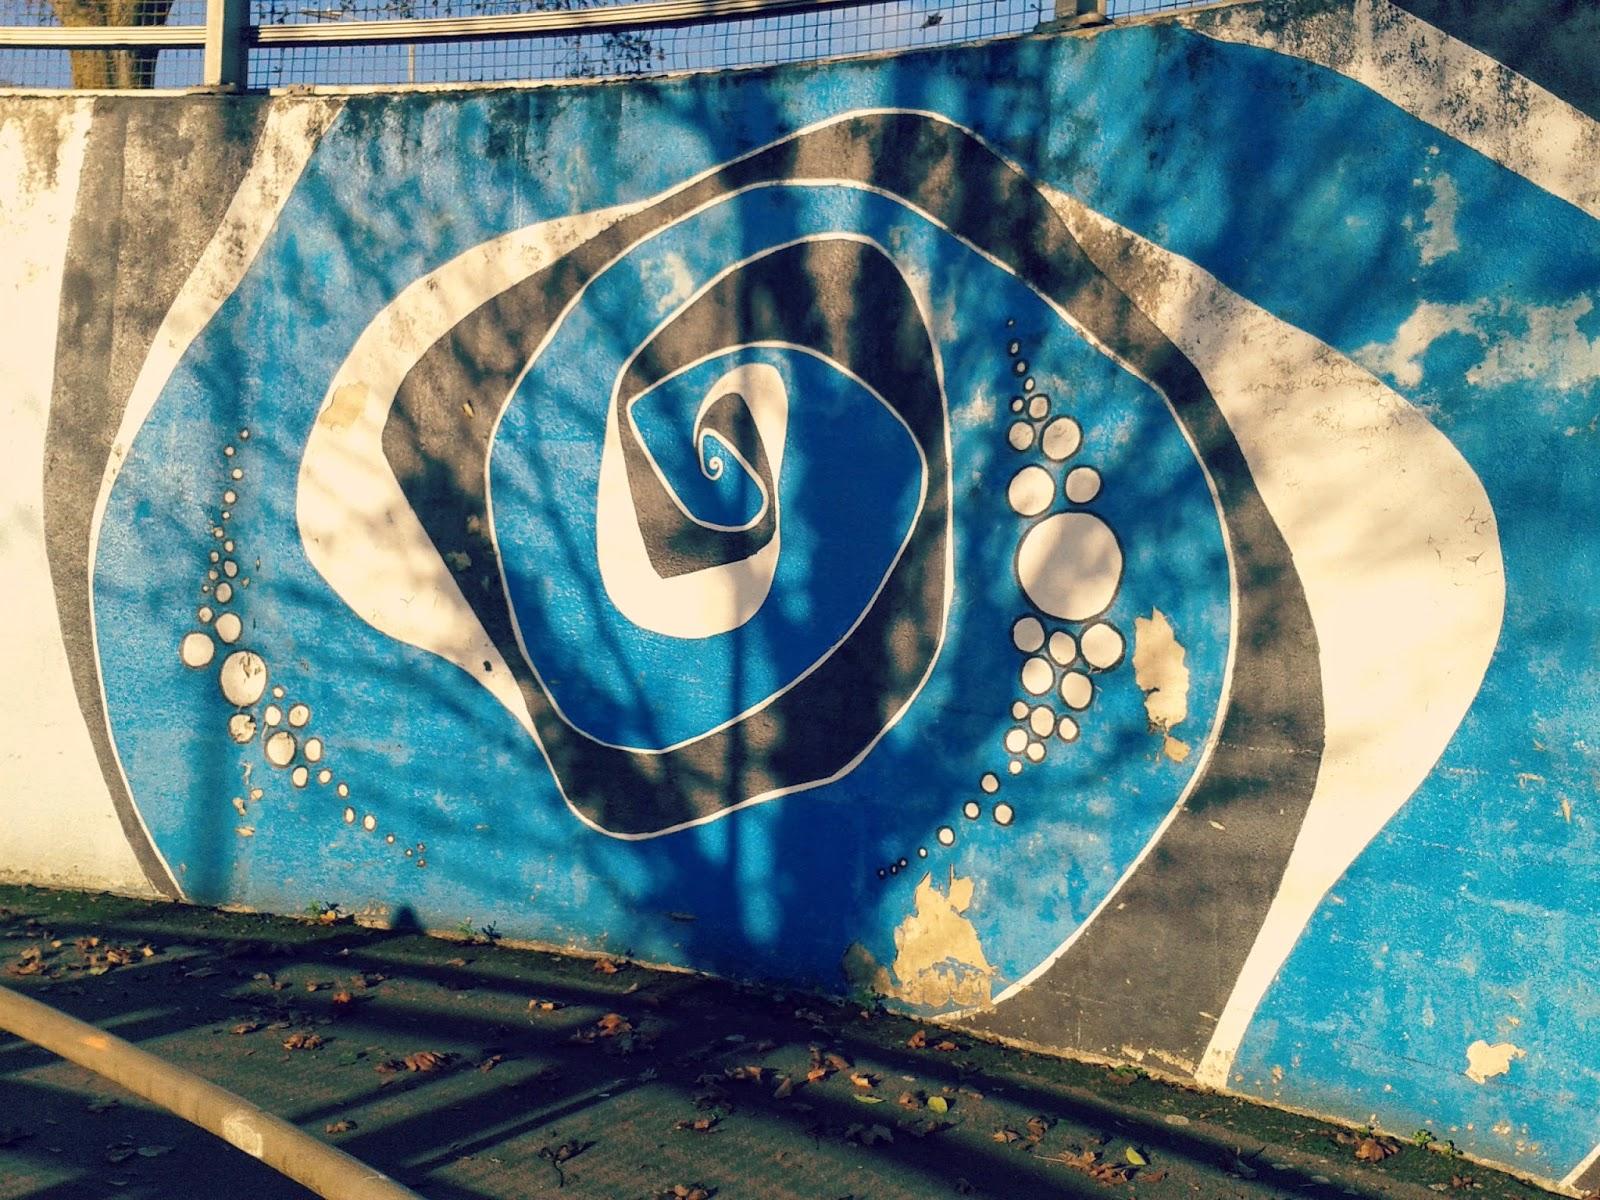 Project 365 day 364 - Grafitti in the Winter sun // 76sunflowers